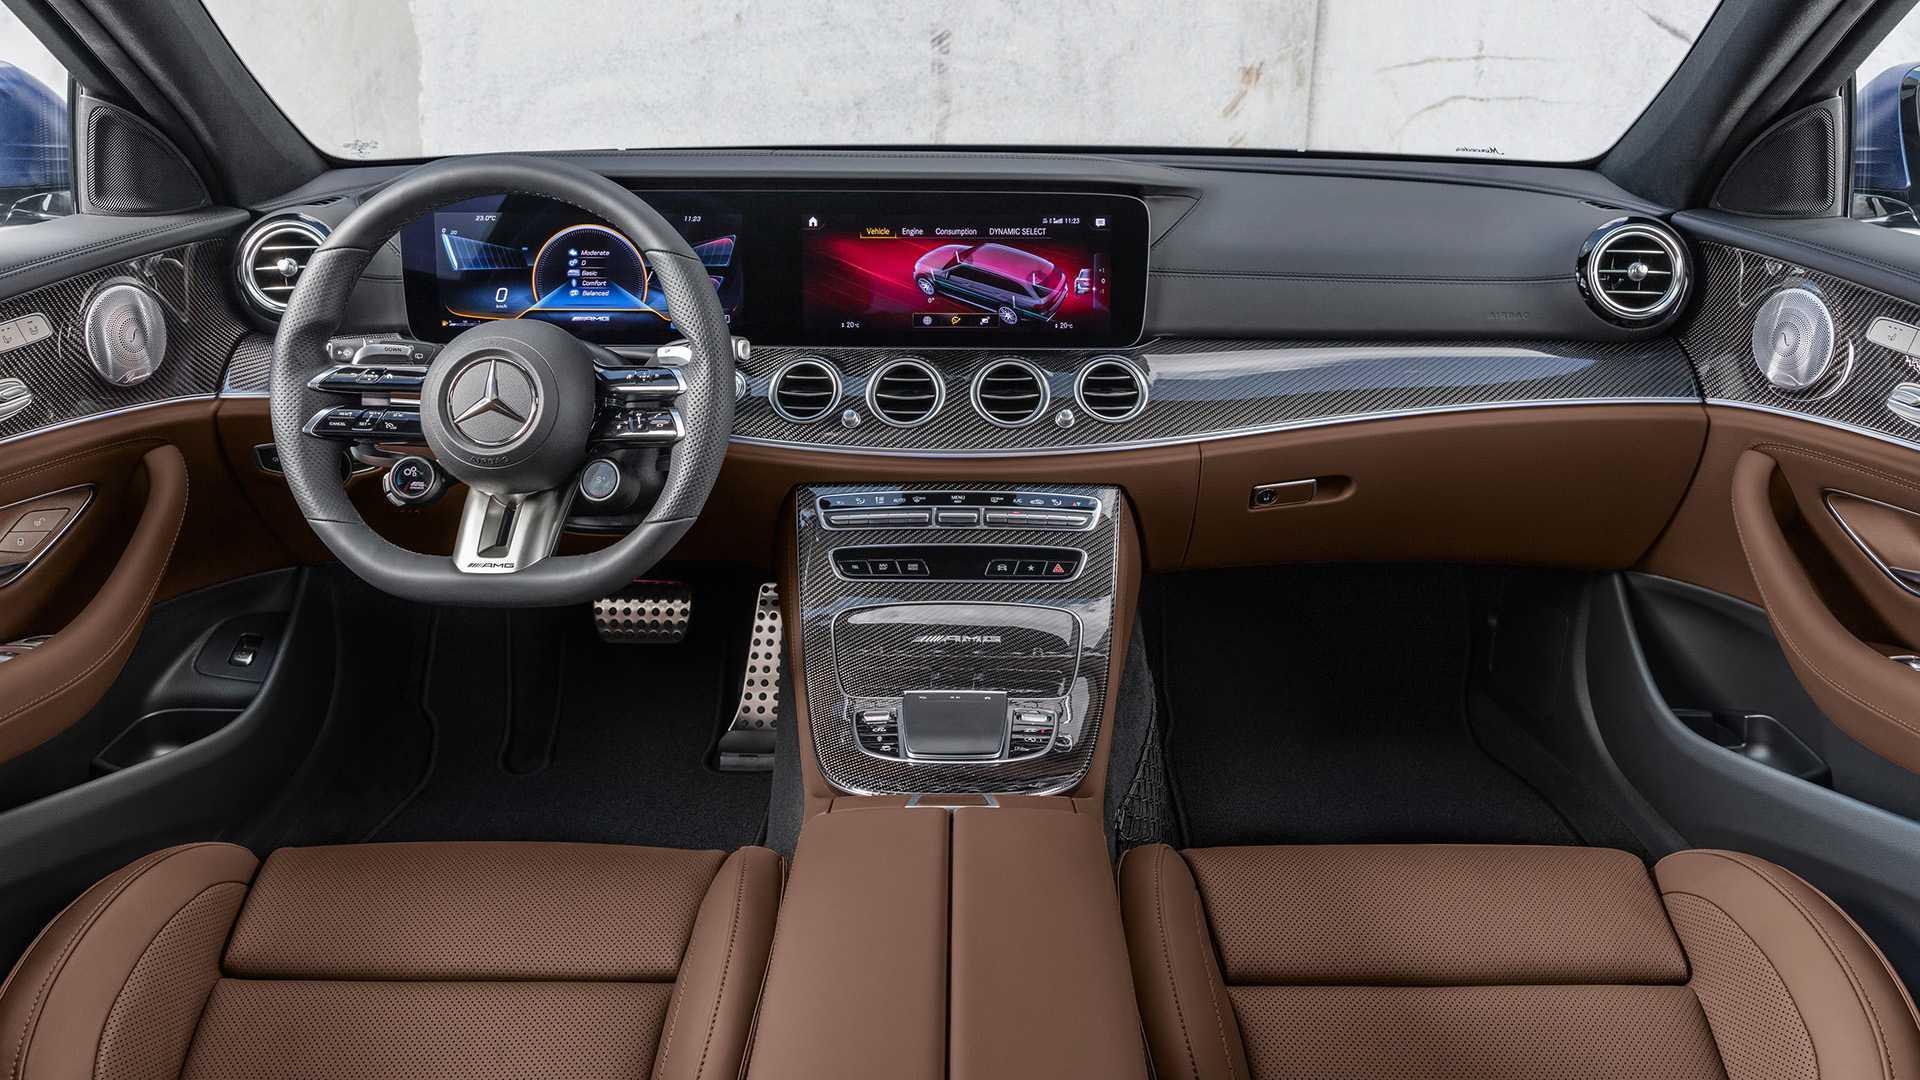 Mercedes-AMG E63 S Kombi (2021)